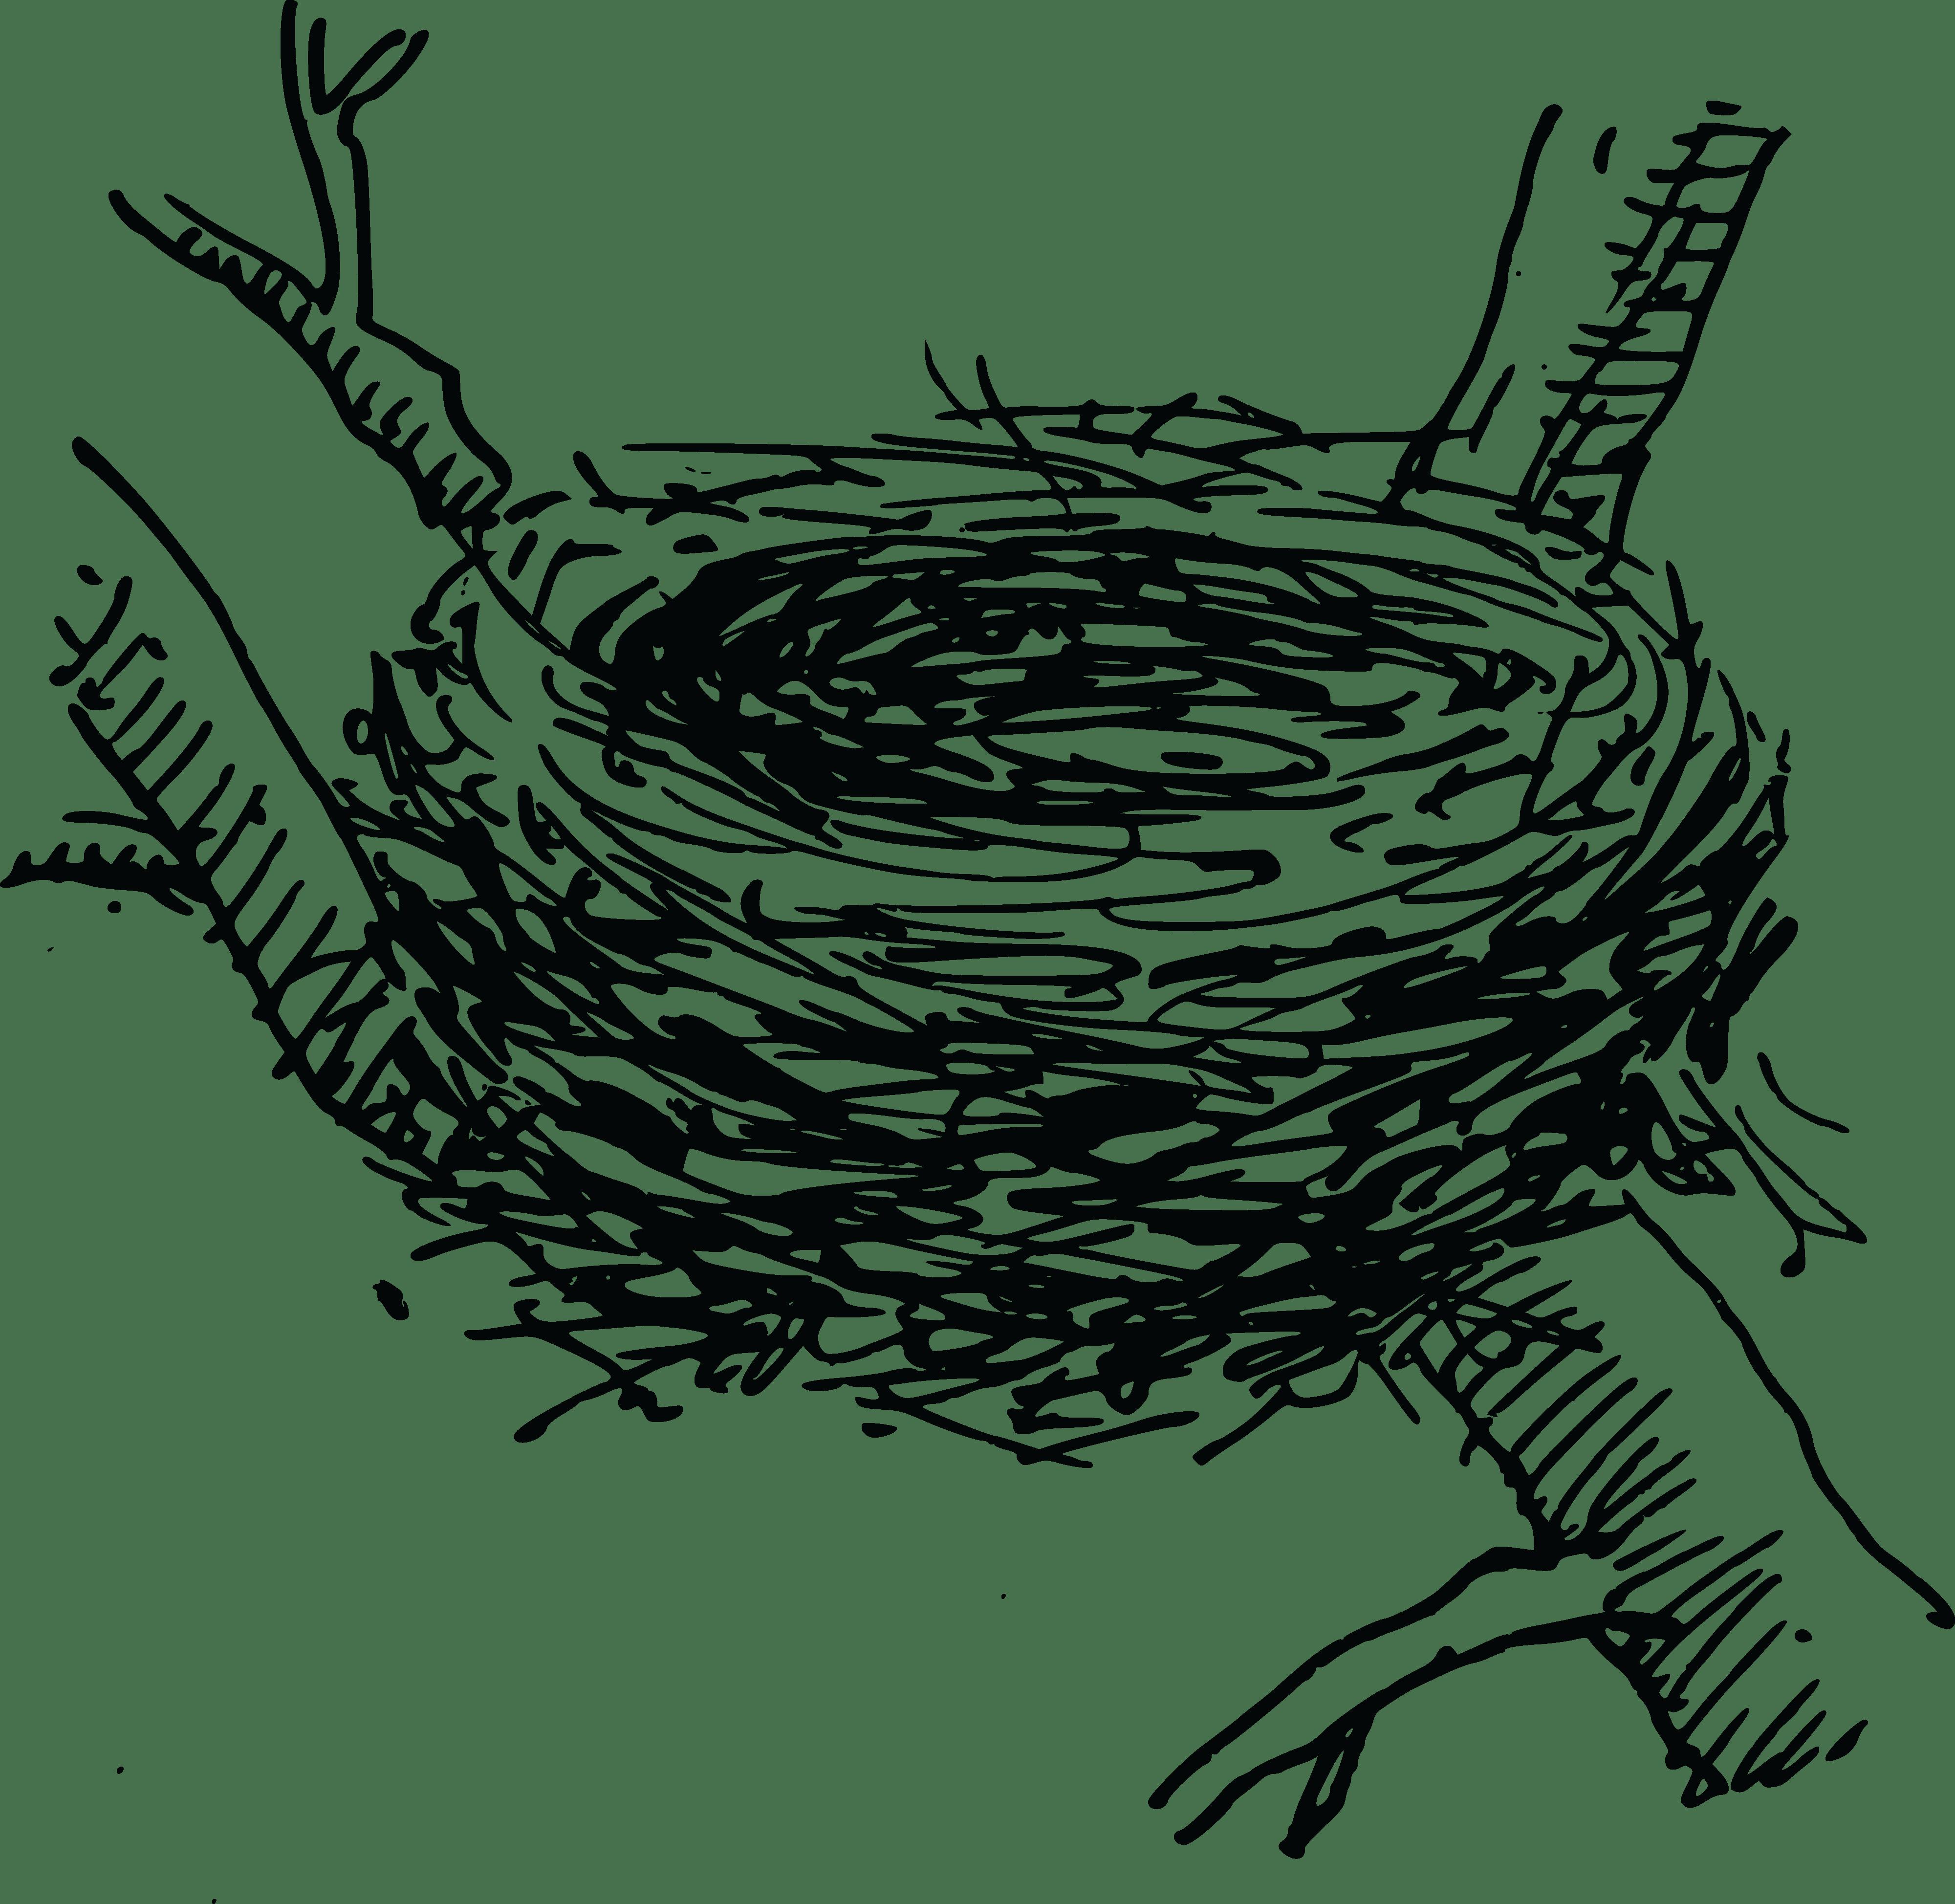 Birds nest clipart black and white 3 » Clipart Portal.